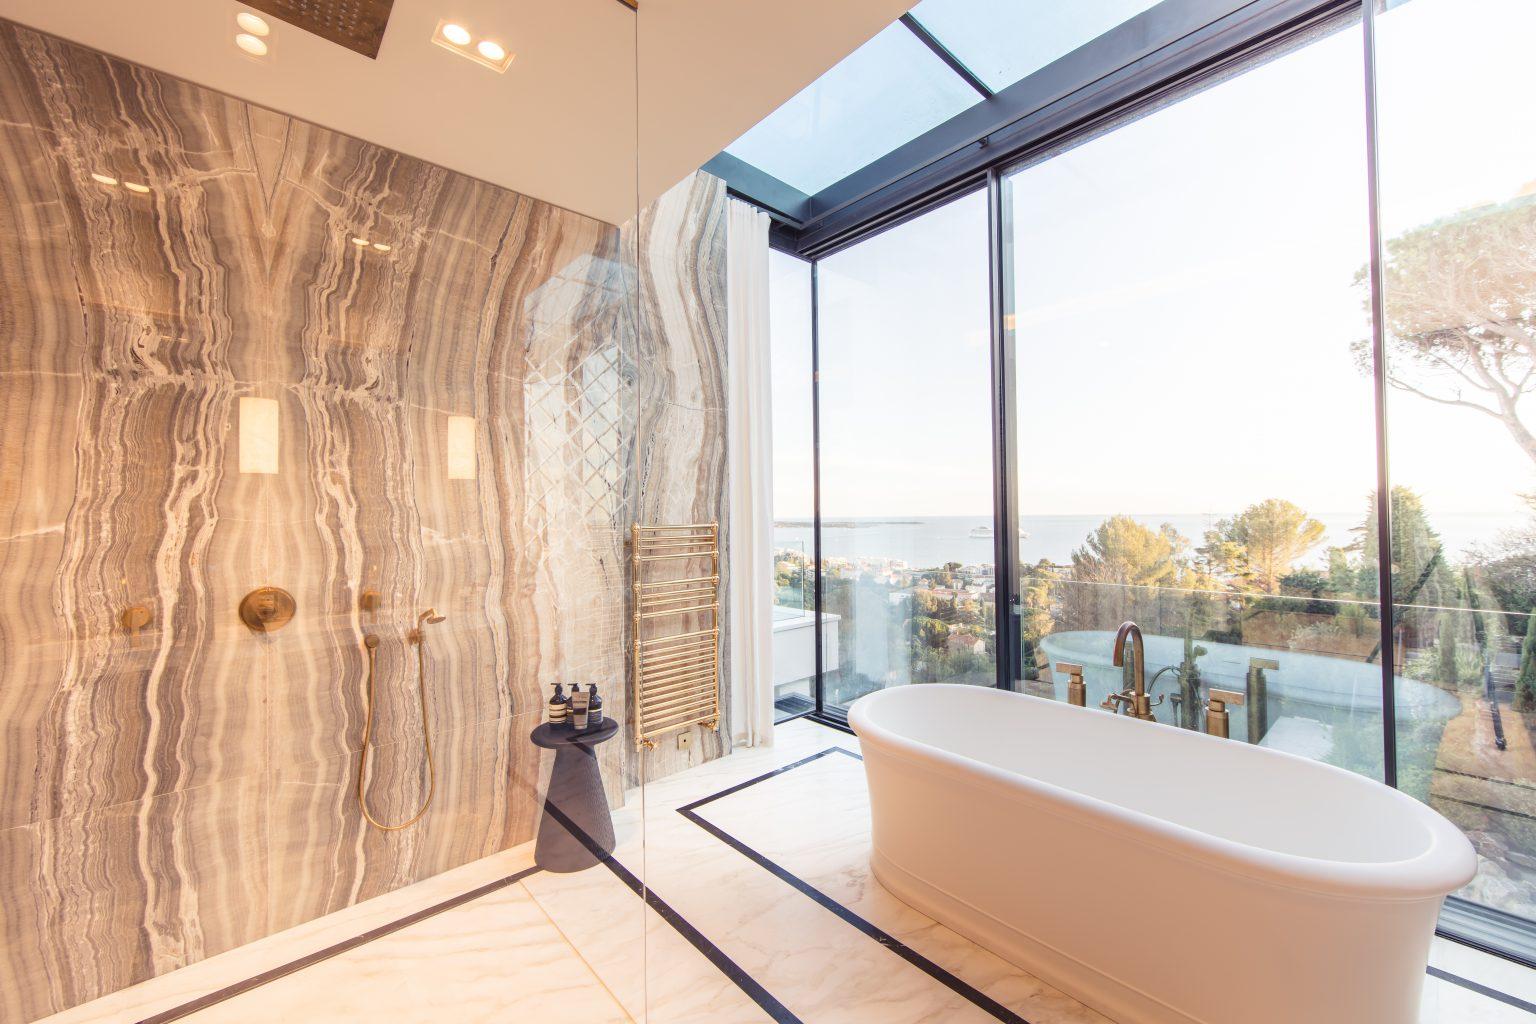 2_villa cannes luxe master bedroom baignoire